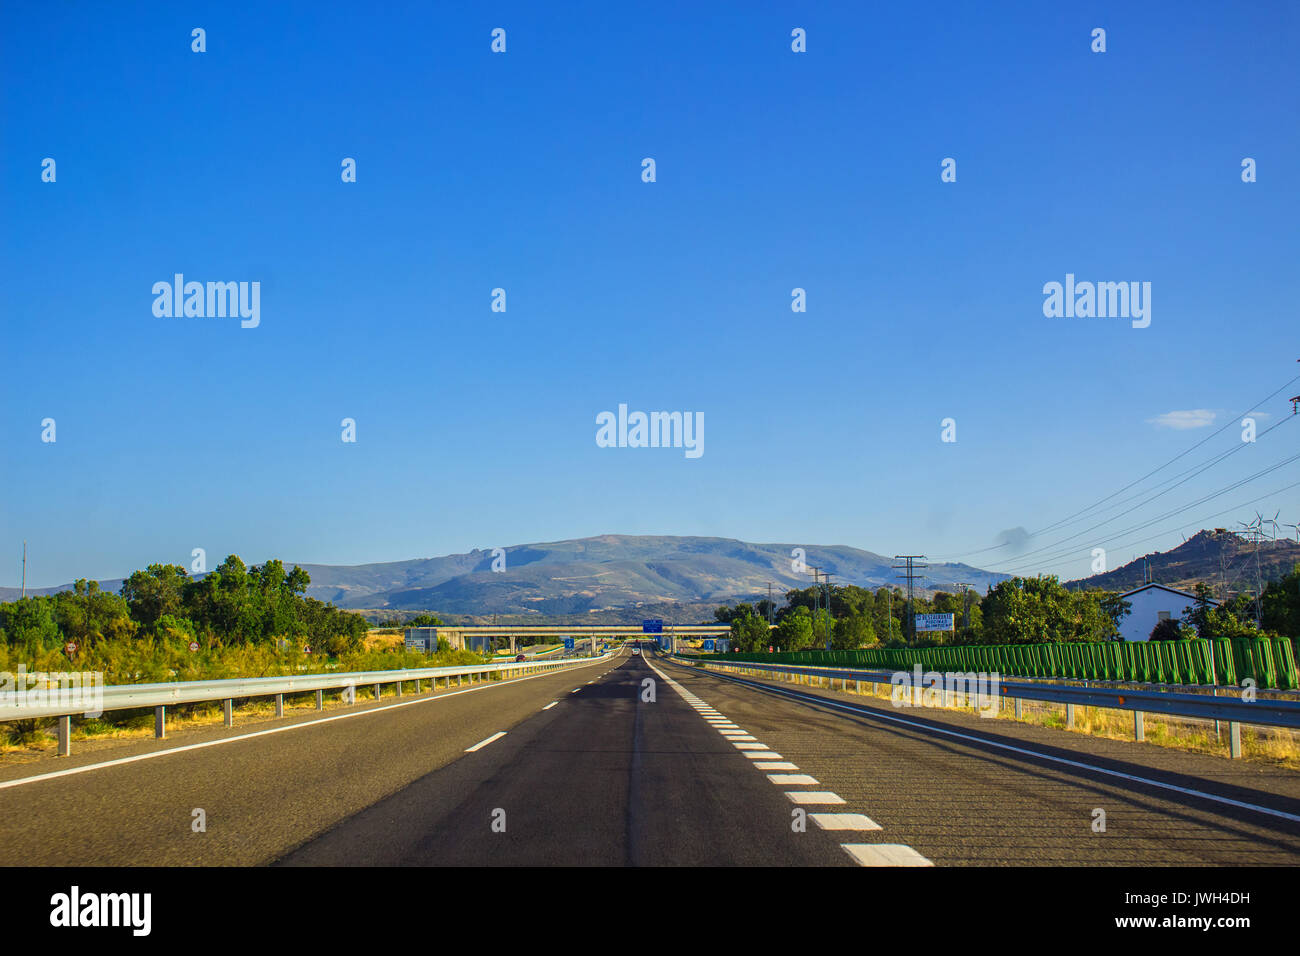 Autovía N-66. Road, horizon, car. Spain. Picture taken – 29 july 2017. - Stock Image